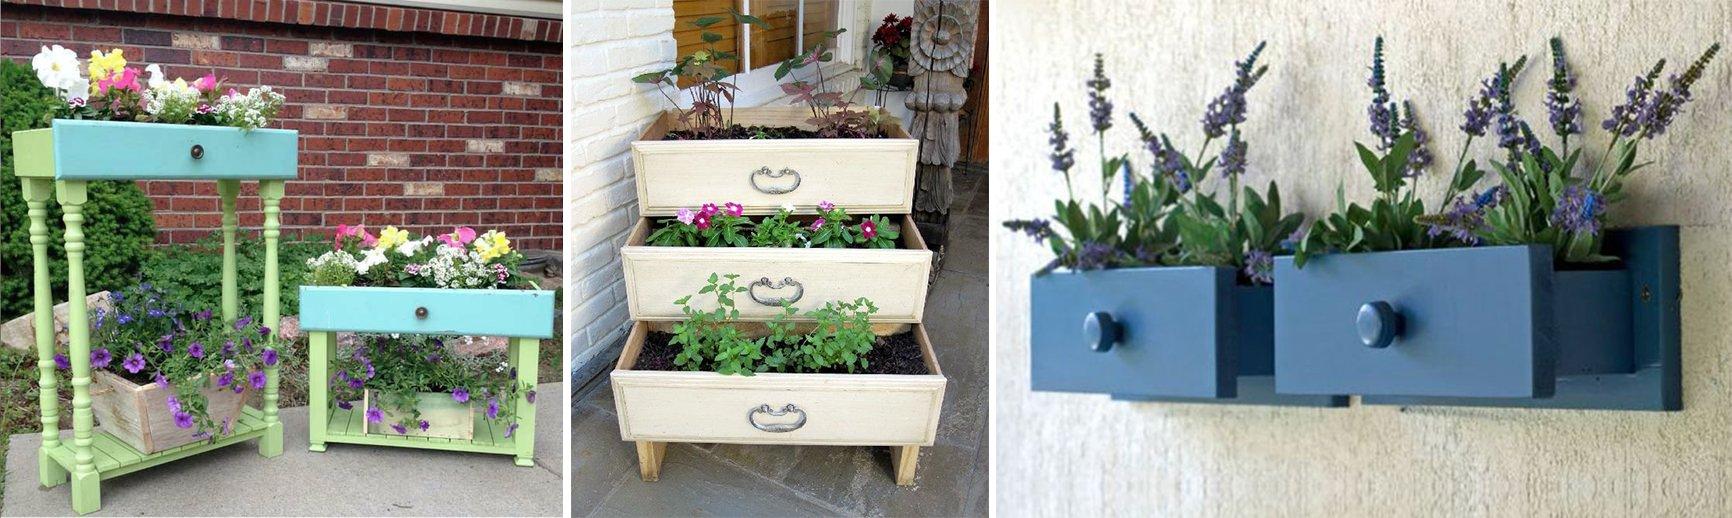 Maceteros de madera originales stunning madera para - Macetas originales para plantas ...